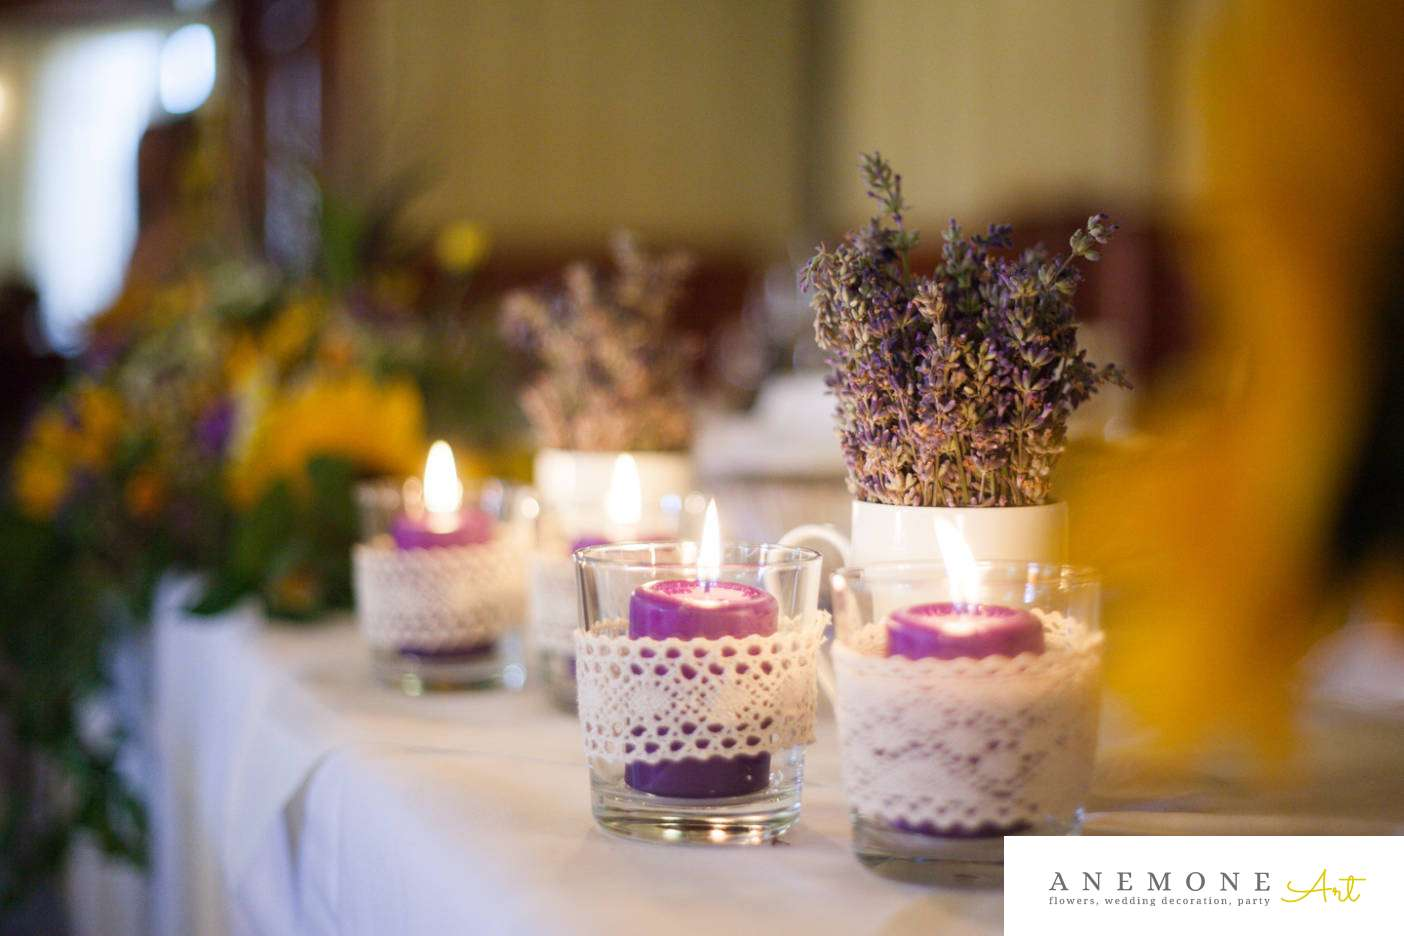 Poza, foto cu Flori de nunta hotel coandi, lavanda, prezidiu in Arad, Timisoara, Oradea (wedding flowers, bouquets) nunta Arad, Timisoara, Oradea